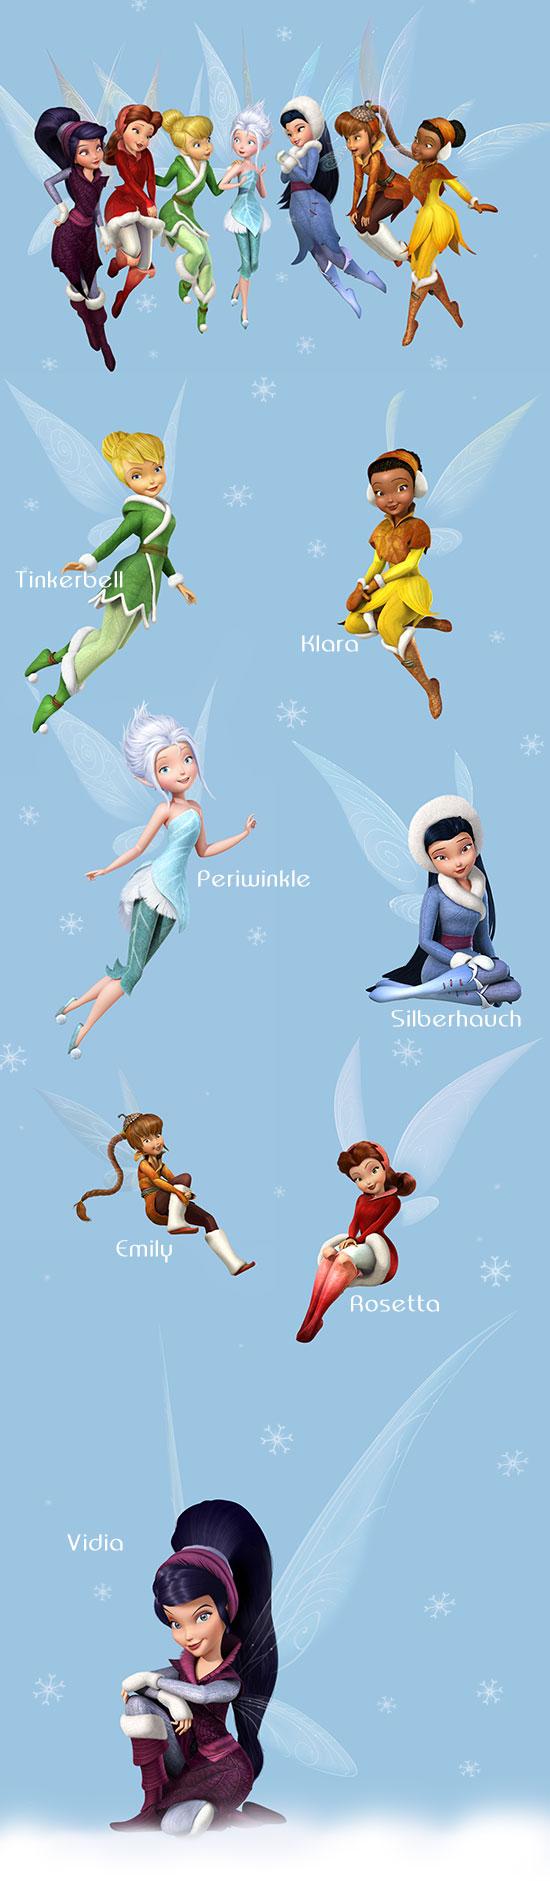 Disney Tinkerbell Pooh B Log Designblog